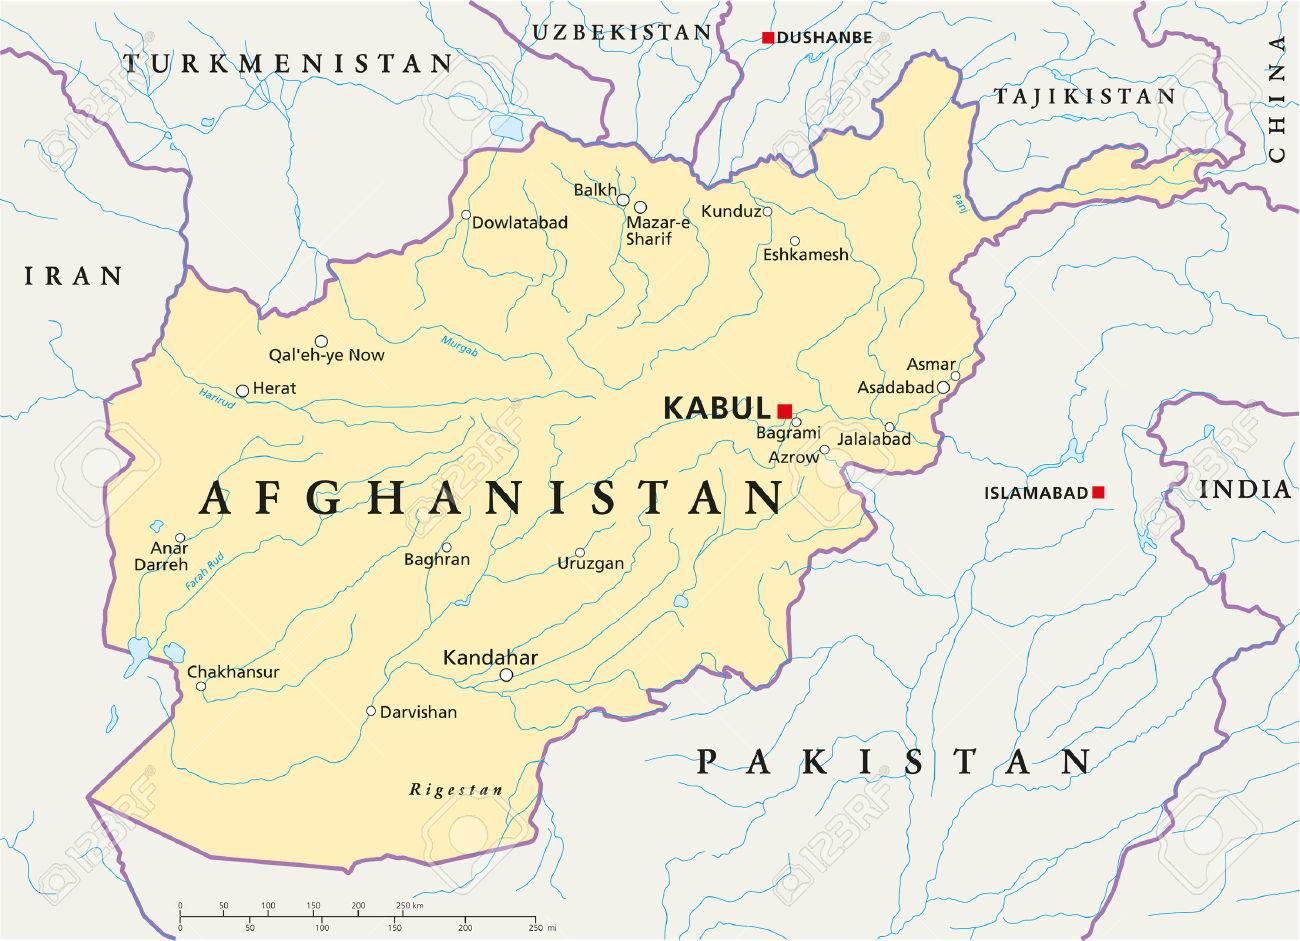 Afghanistan Political Map With Capital Kabul National Borders - Afghanistan political map